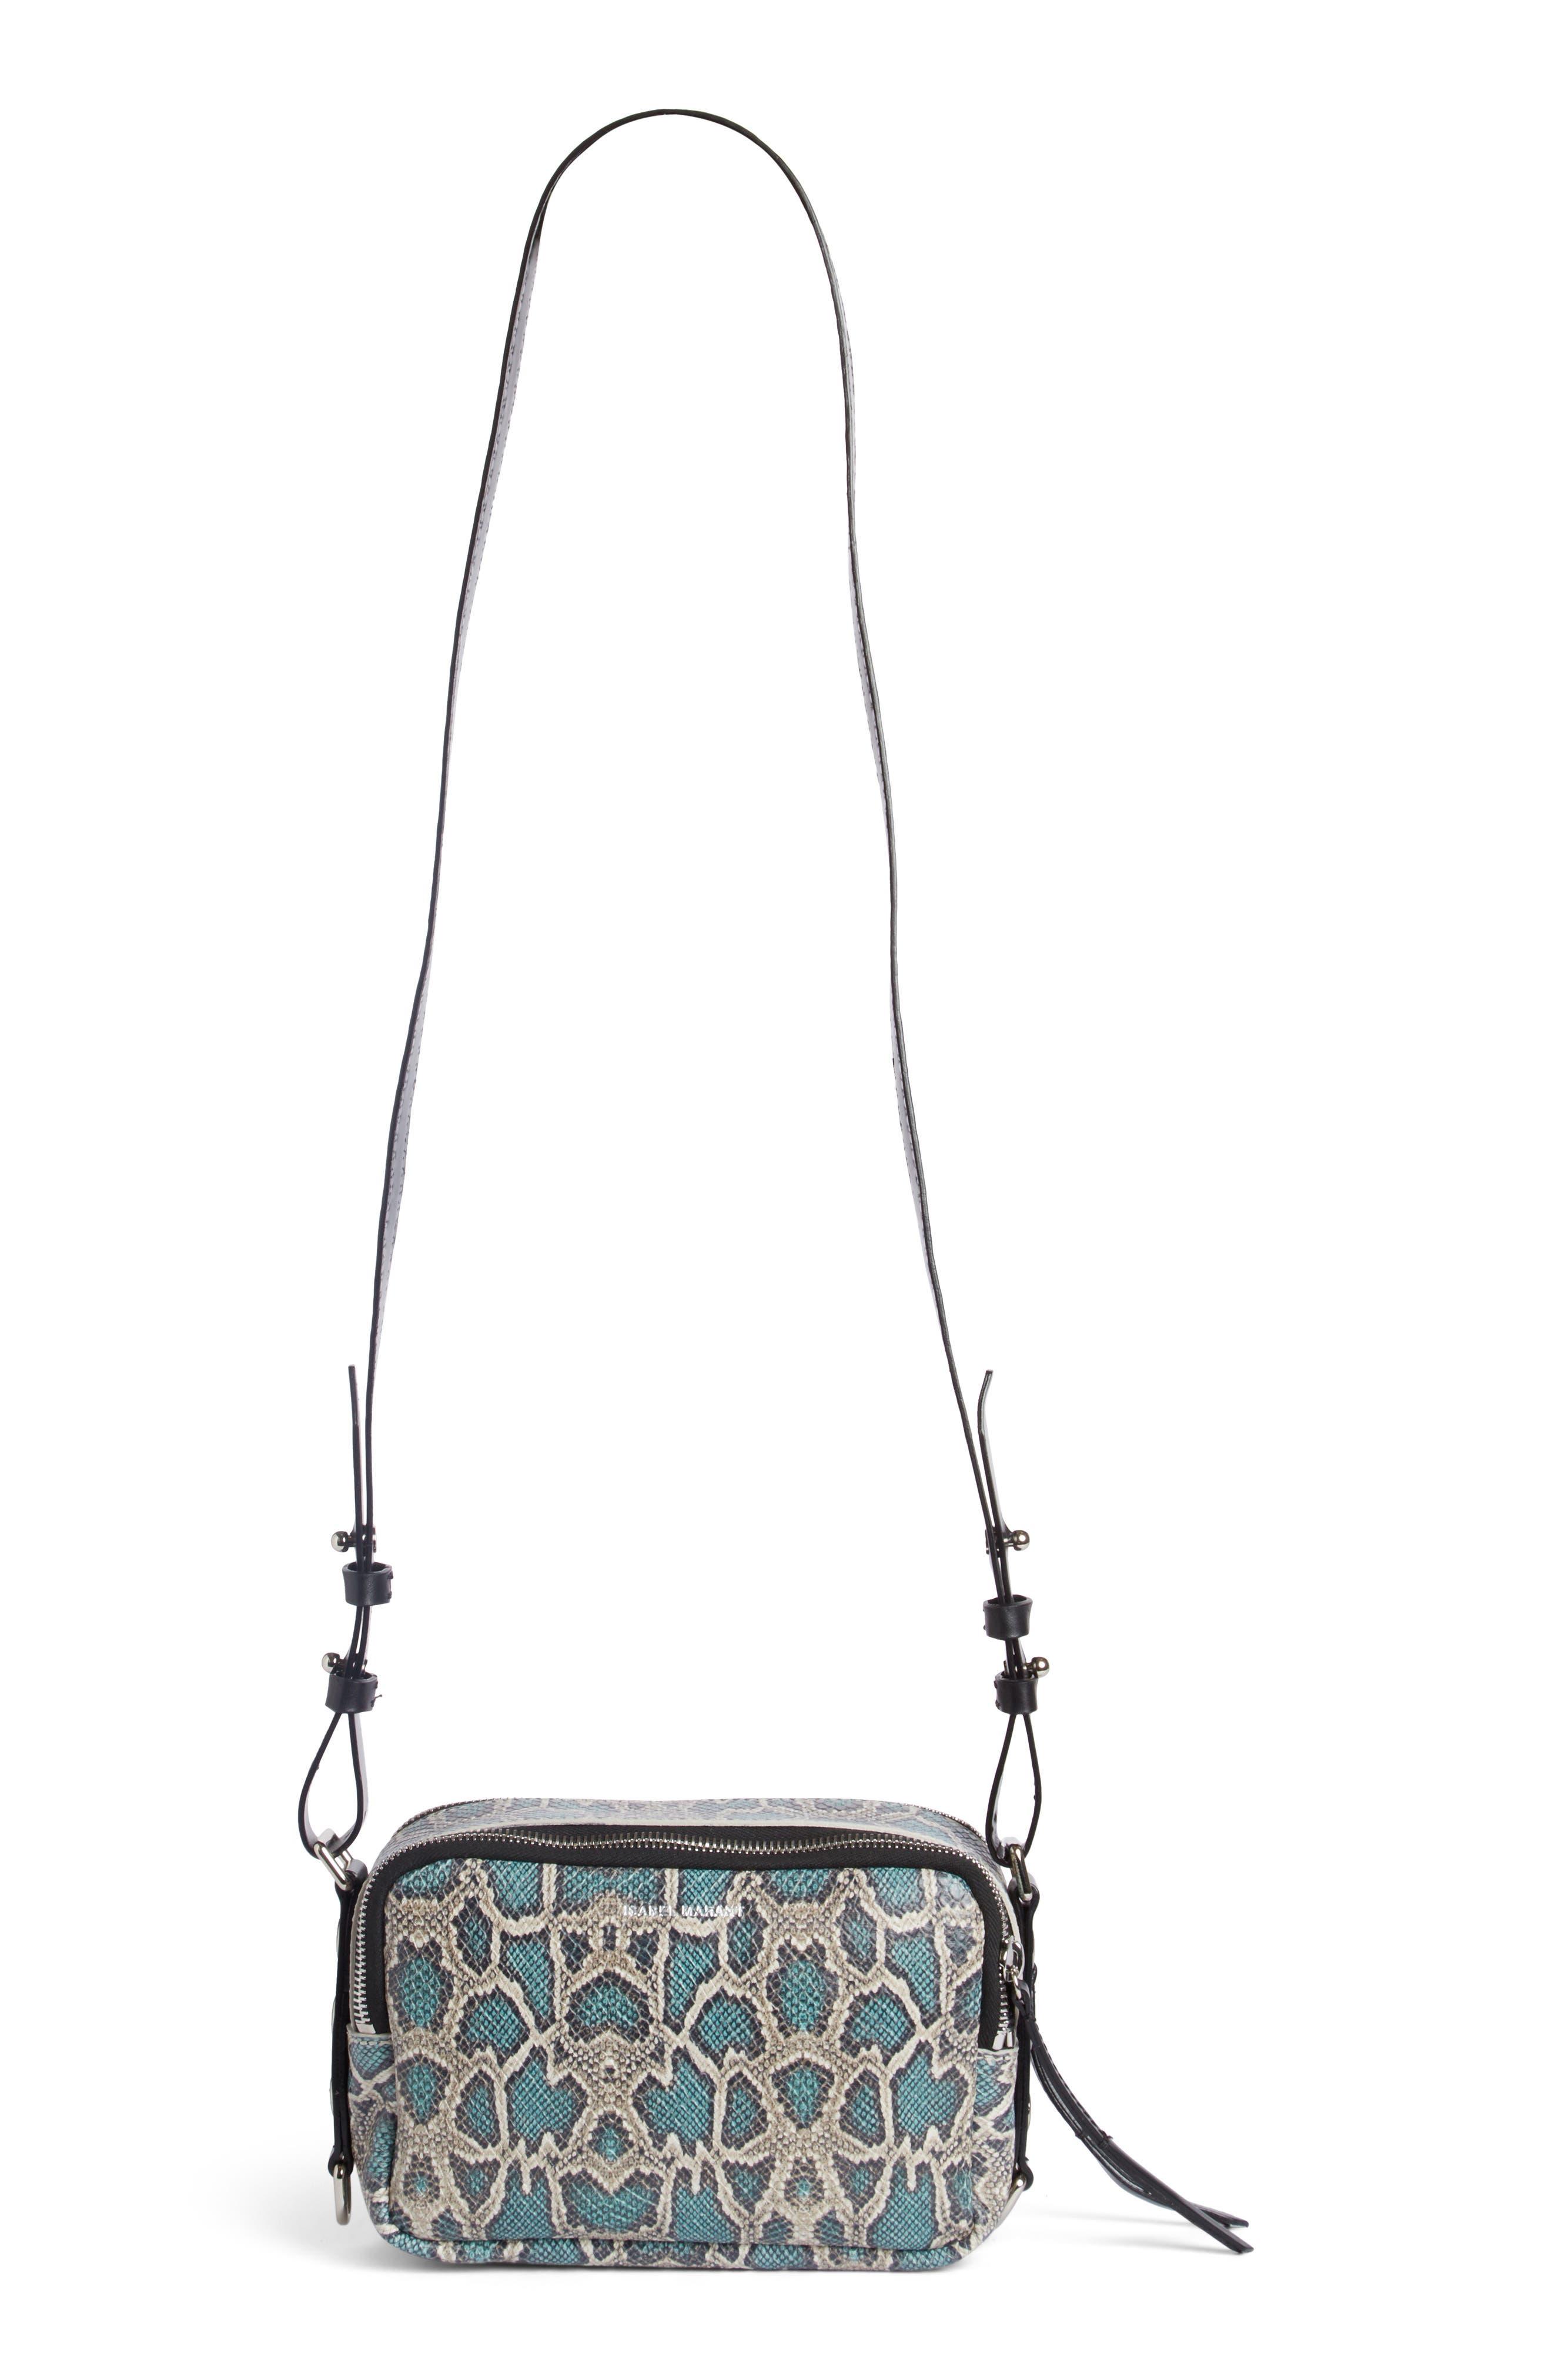 Tinley Studded Leather Crossbody Bag,                             Main thumbnail 1, color,                             Verdigris